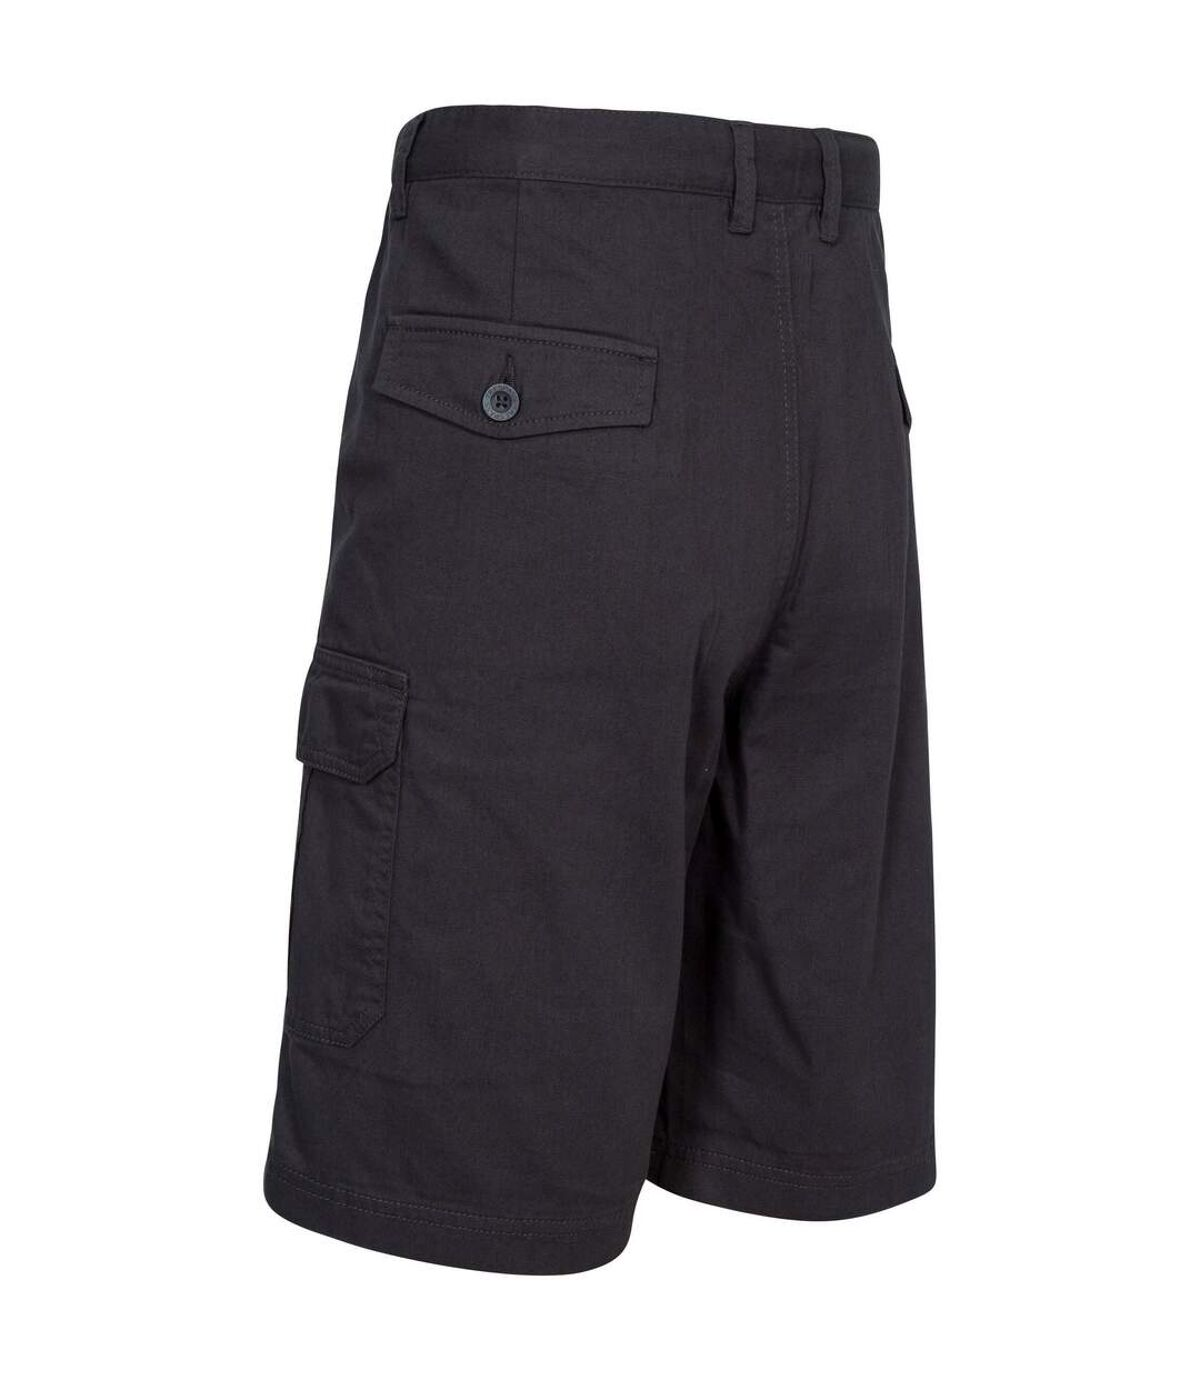 Trespass Mens Rawson Shorts (Charcoal) - UTTP4574